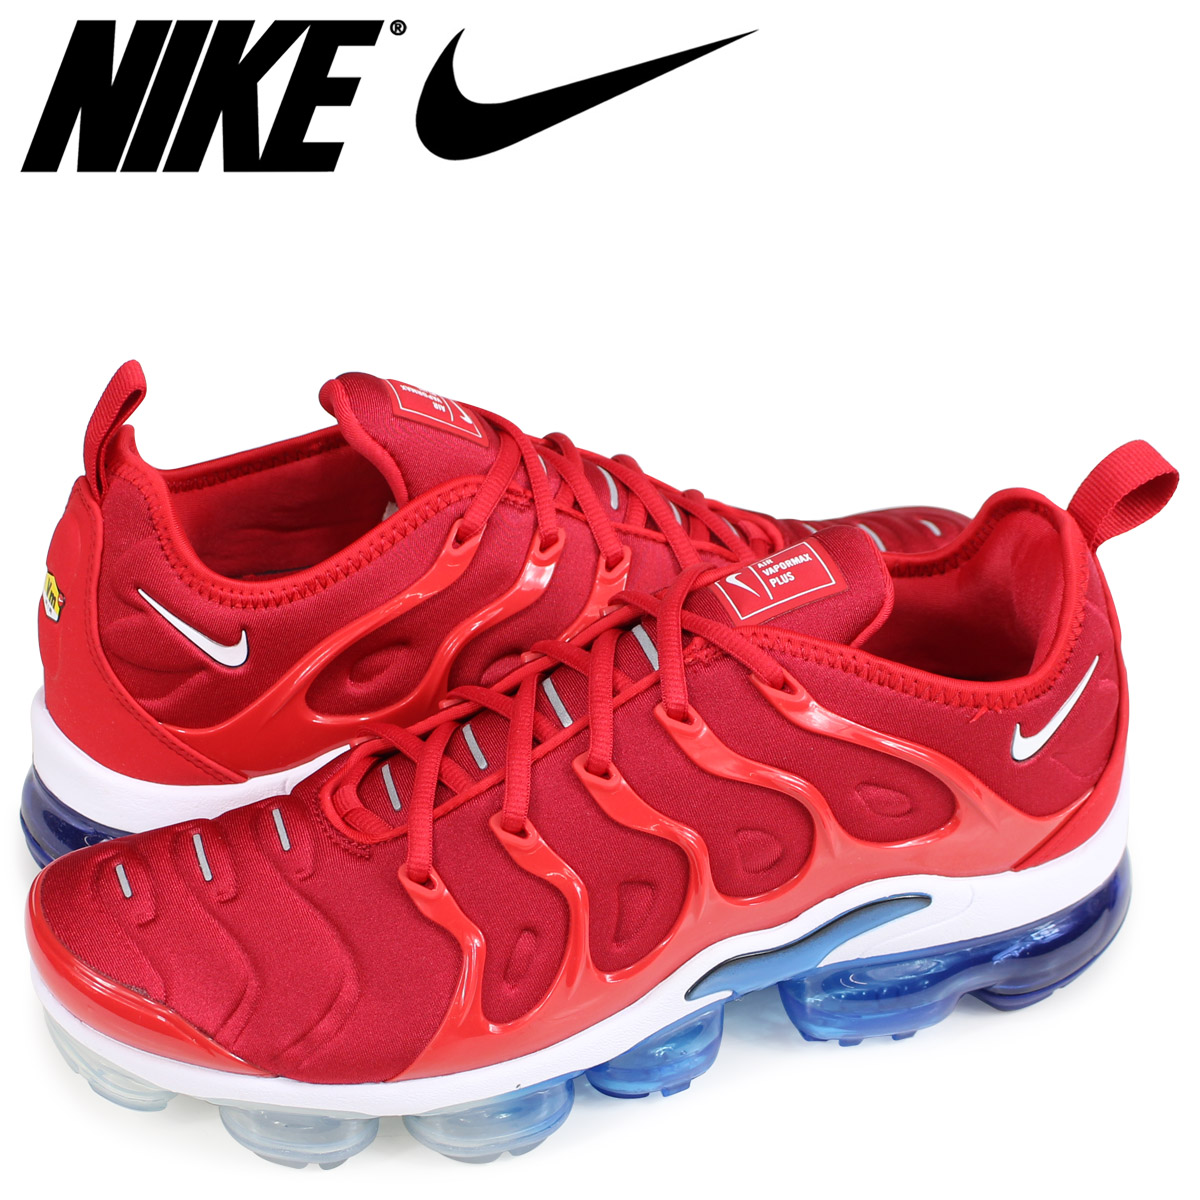 size 40 e567f 1a8dd NIKE AIR VAPORMAX PLUS Nike air vapor max plus sneakers men red 924,453-601